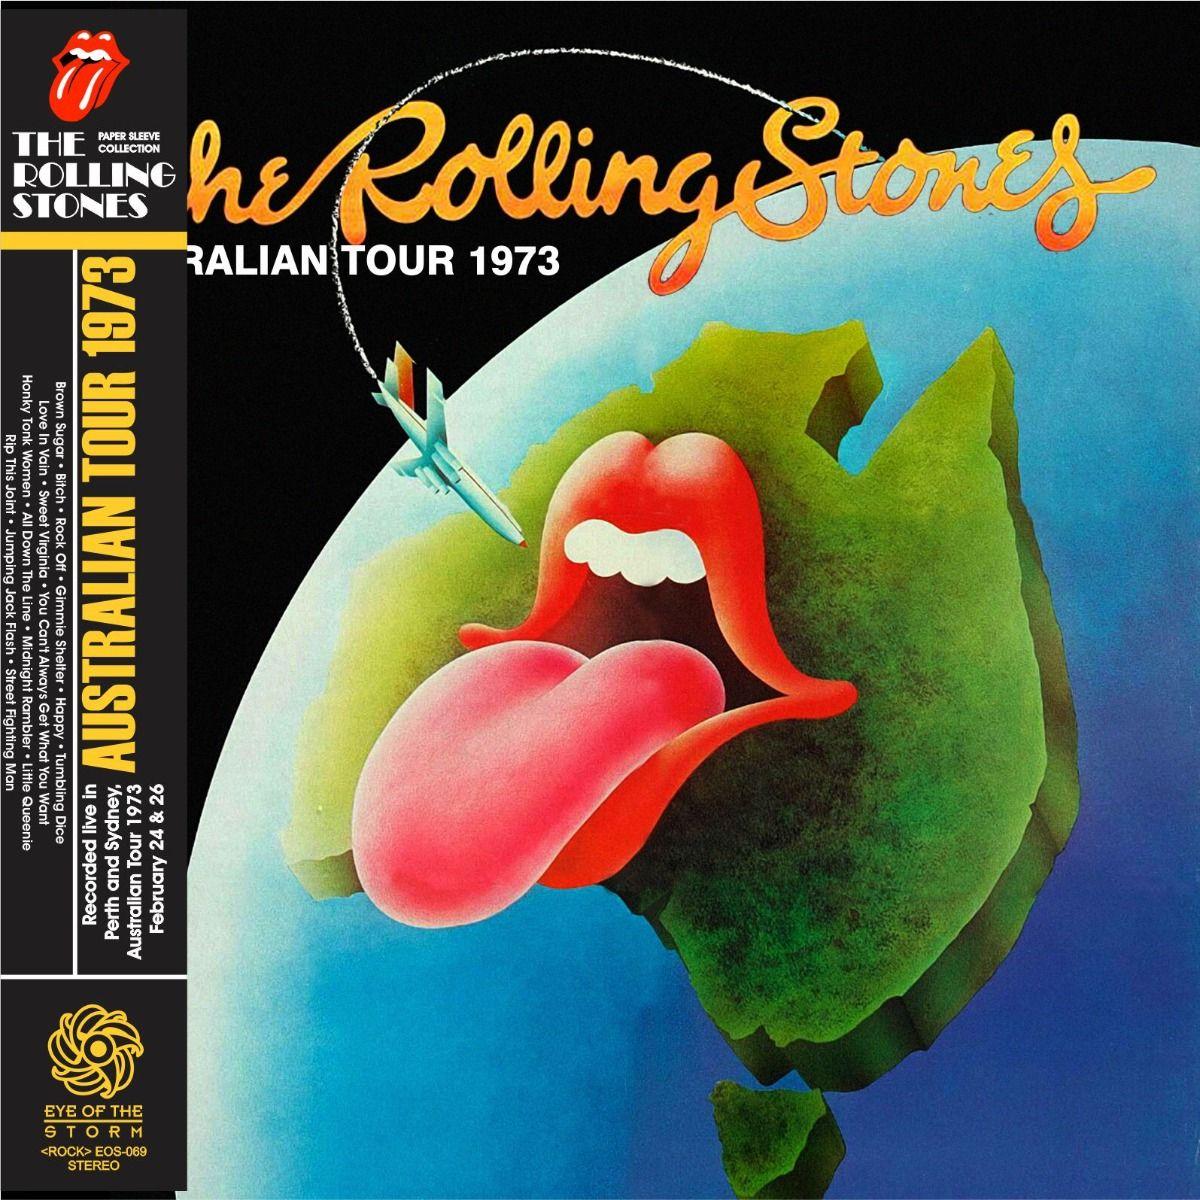 ROLLING STONES Australia 1972